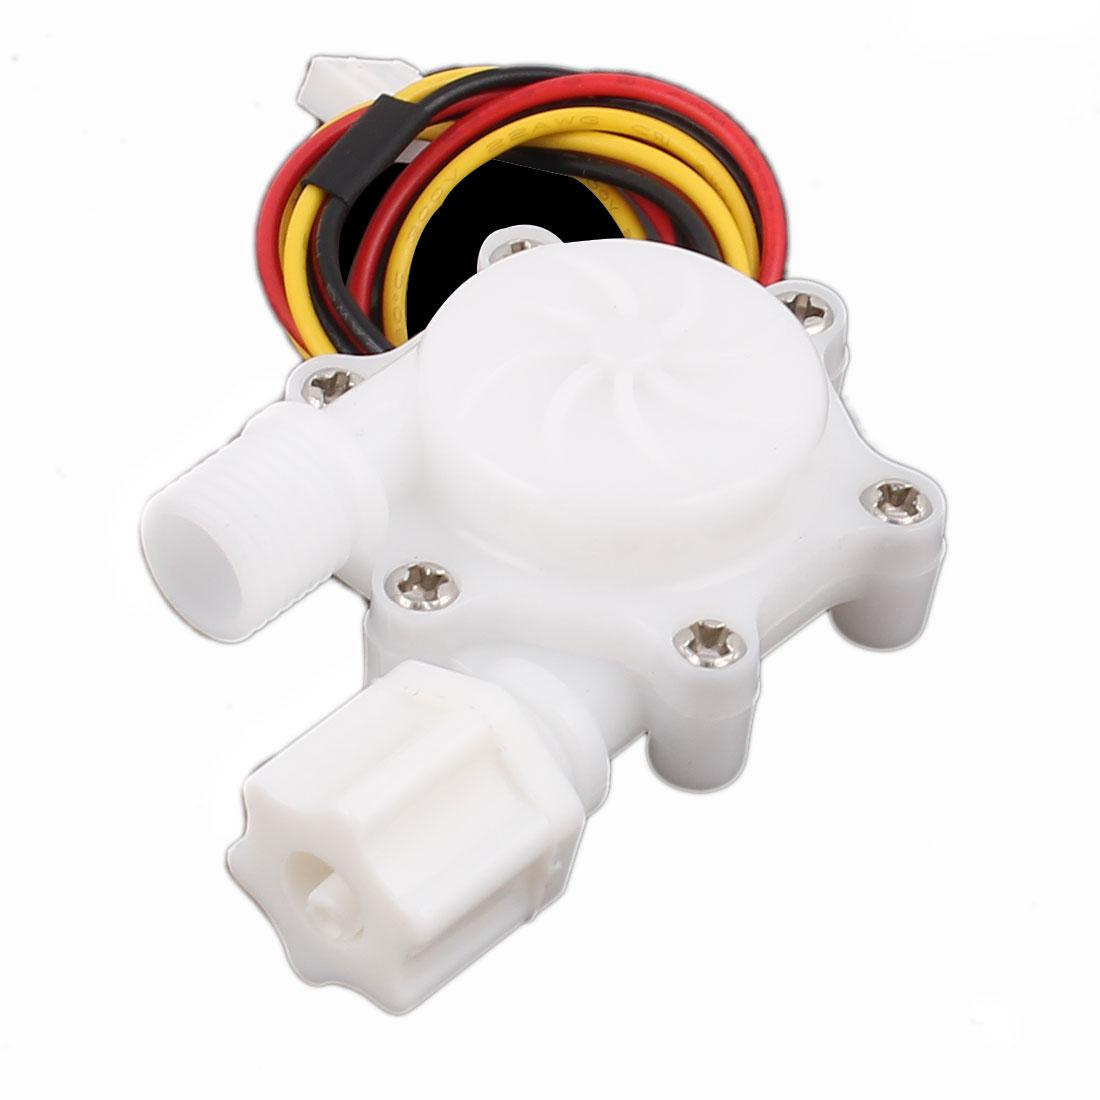 "High Precision 0.15-1.5L/min G1/4"" Inlet Outlet Water Flow Sensor SEN-HW06W"